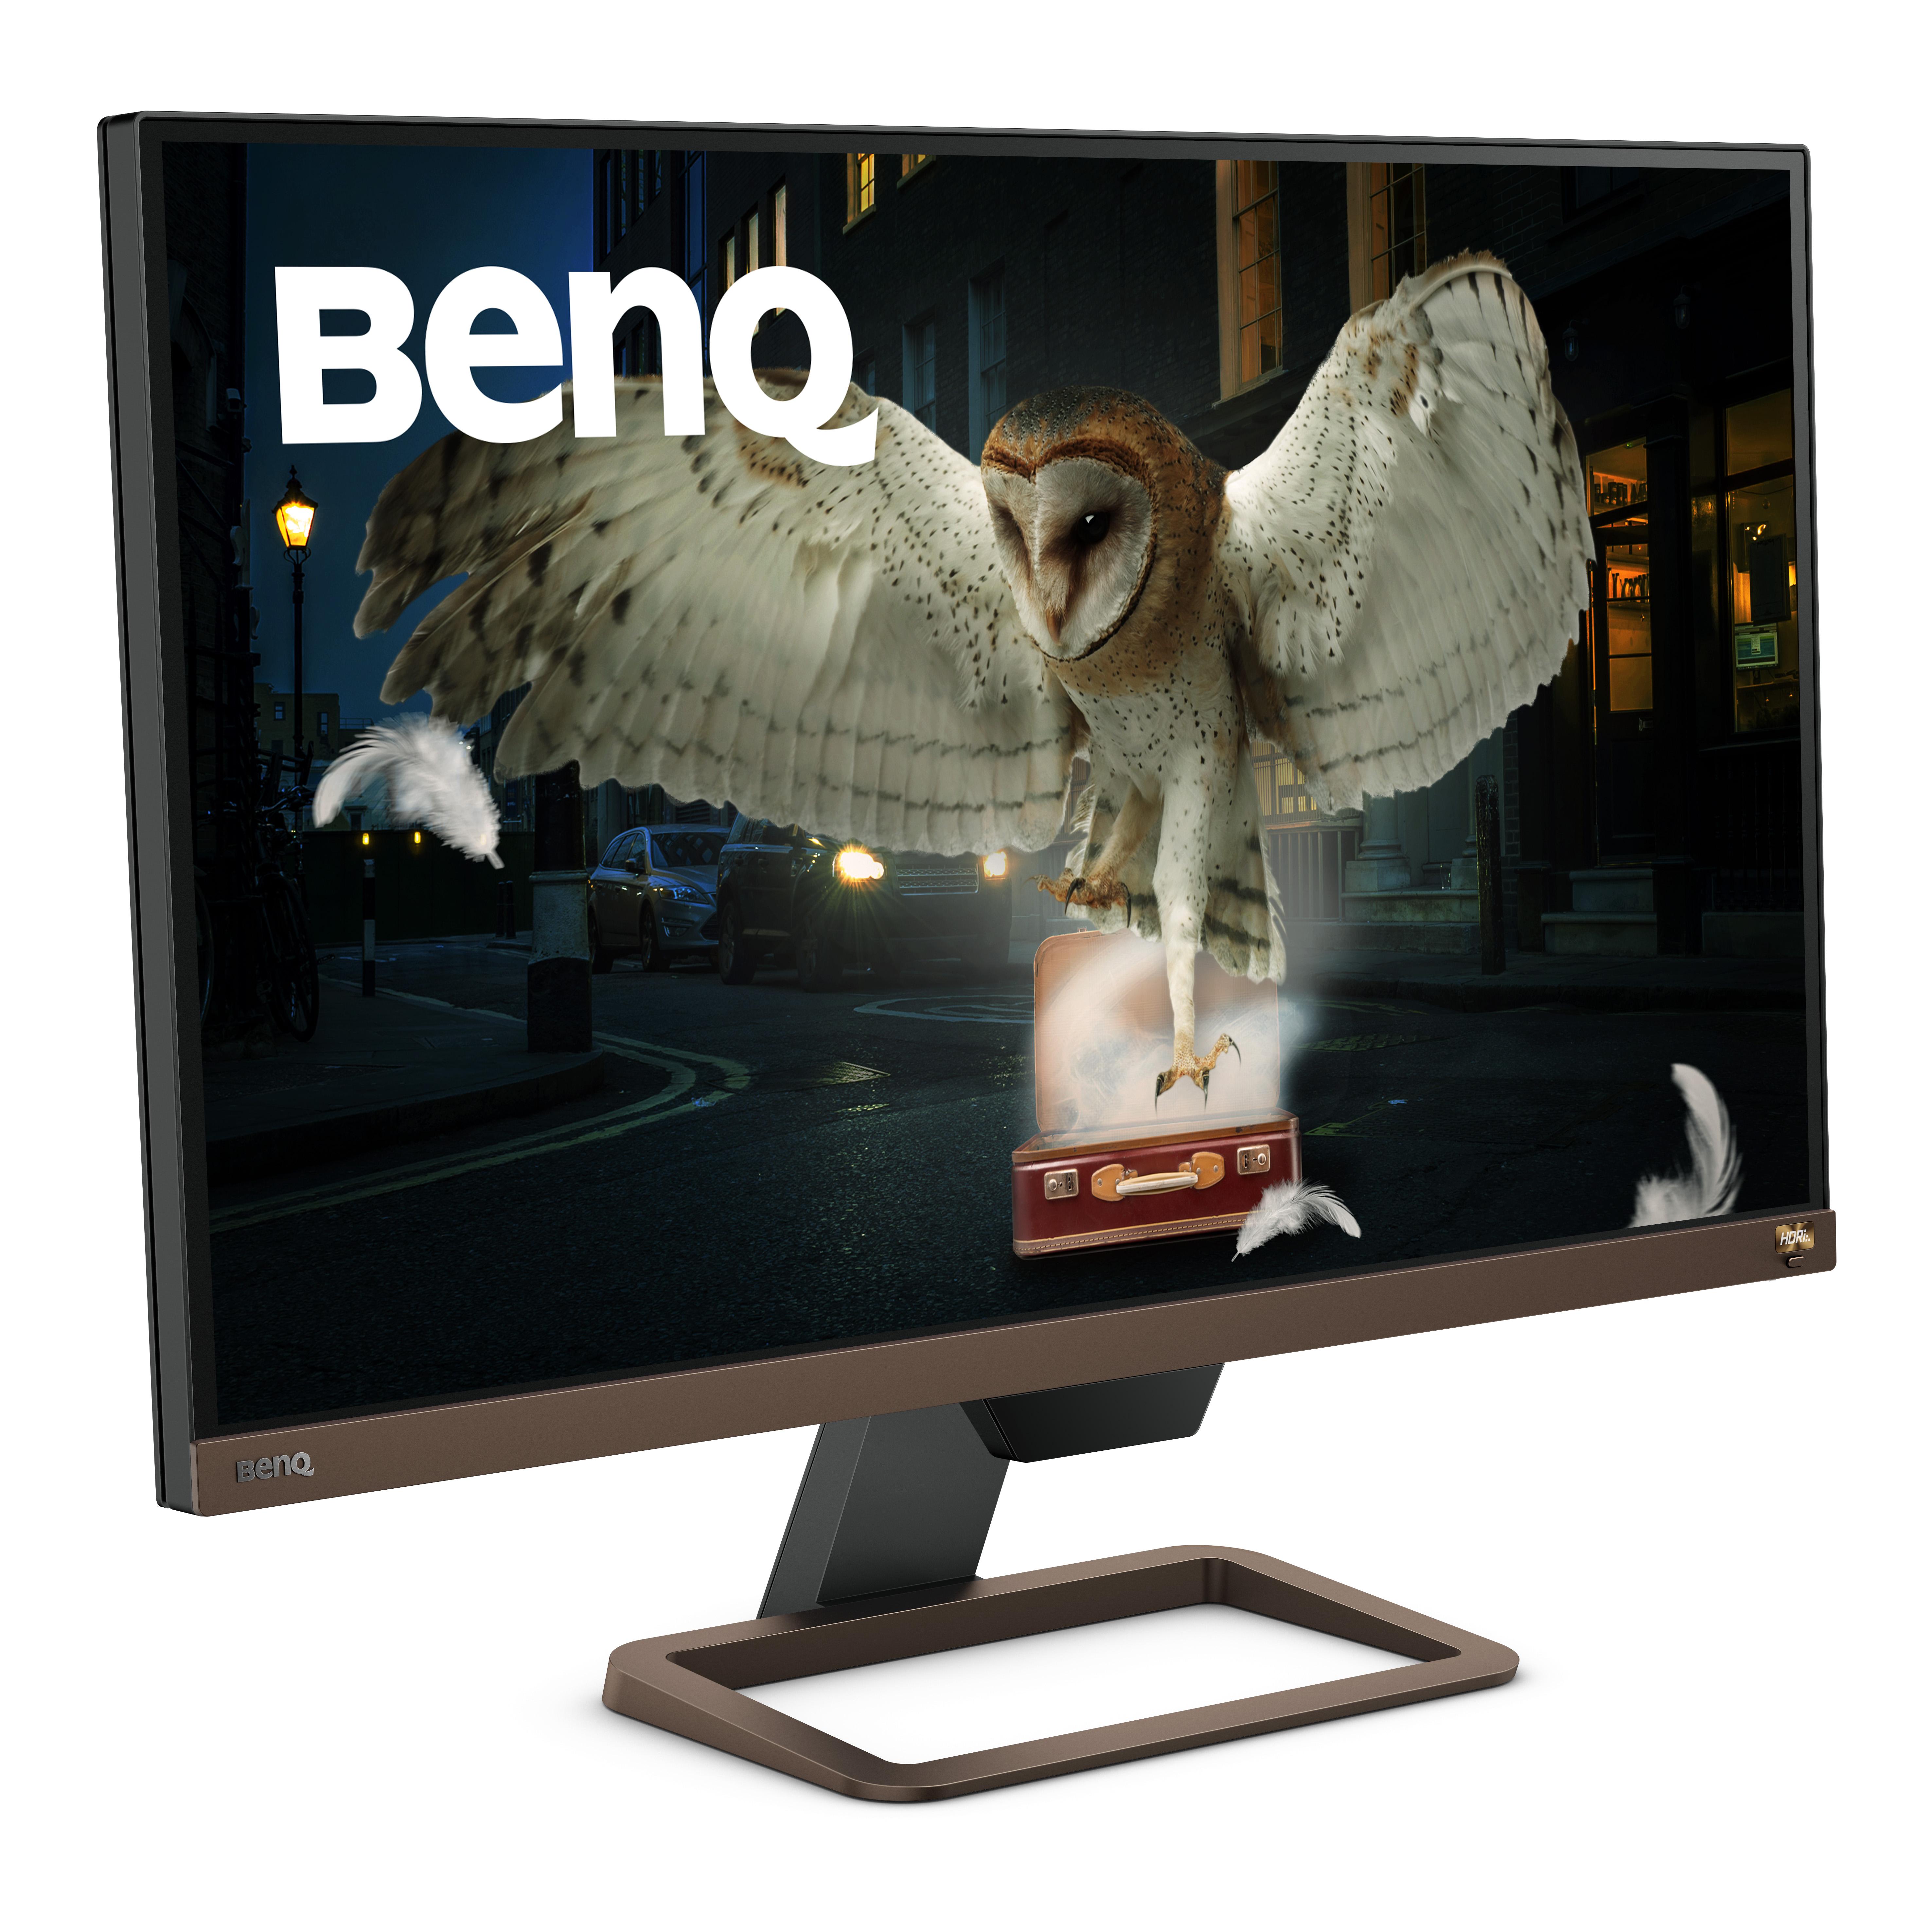 [BenQ] 아이케어 HDR 27인치 4K UHD 모니터 (EW2780U)